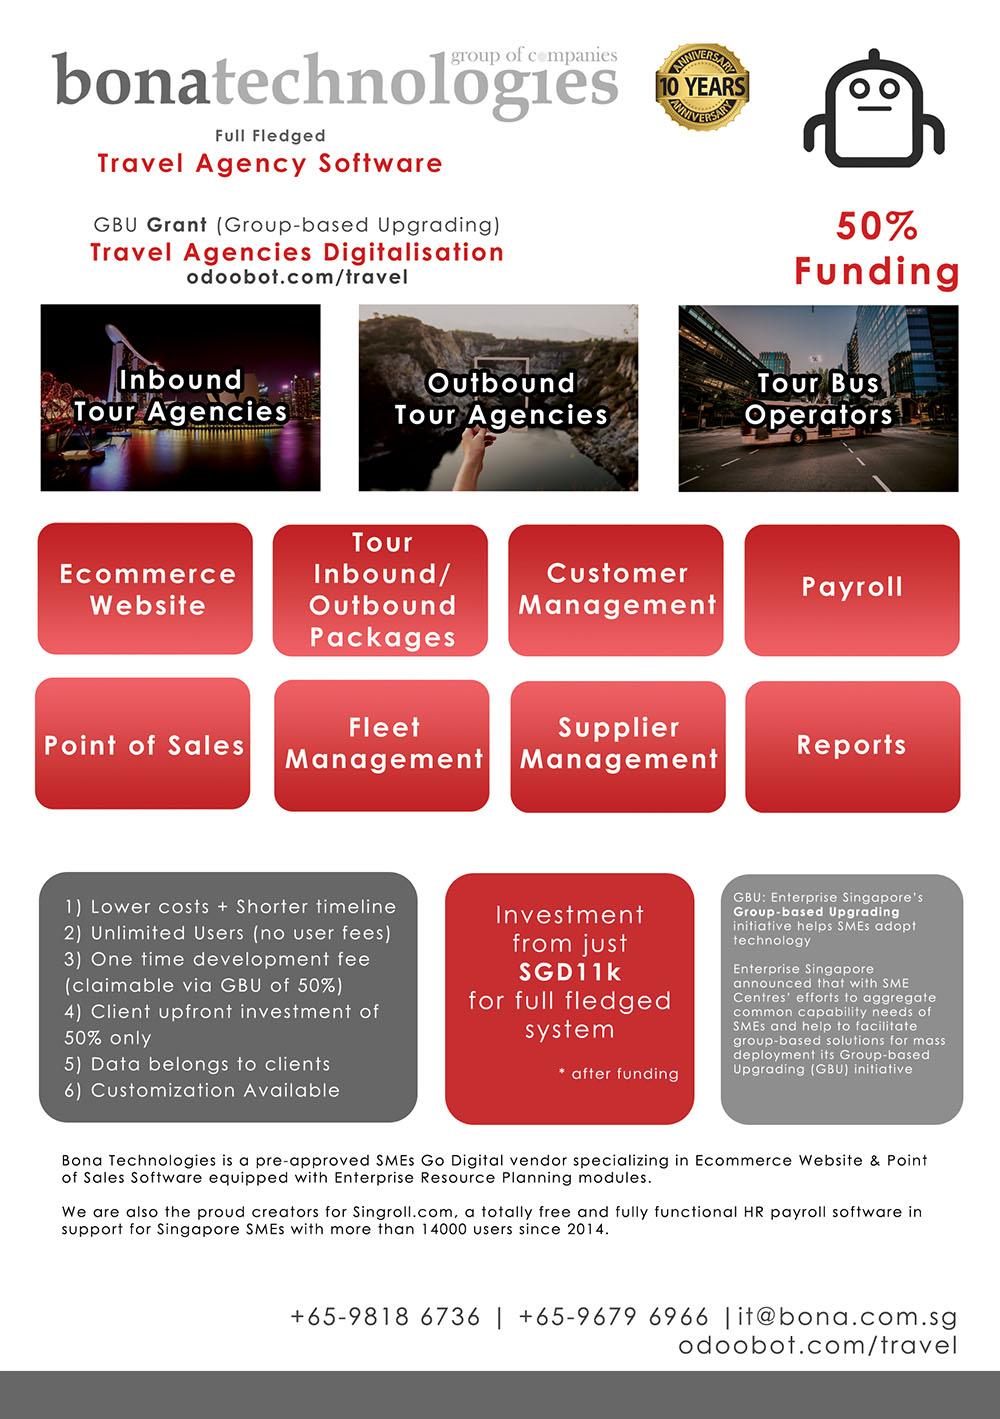 GBU Grant for Travel Agencies Digitalisation